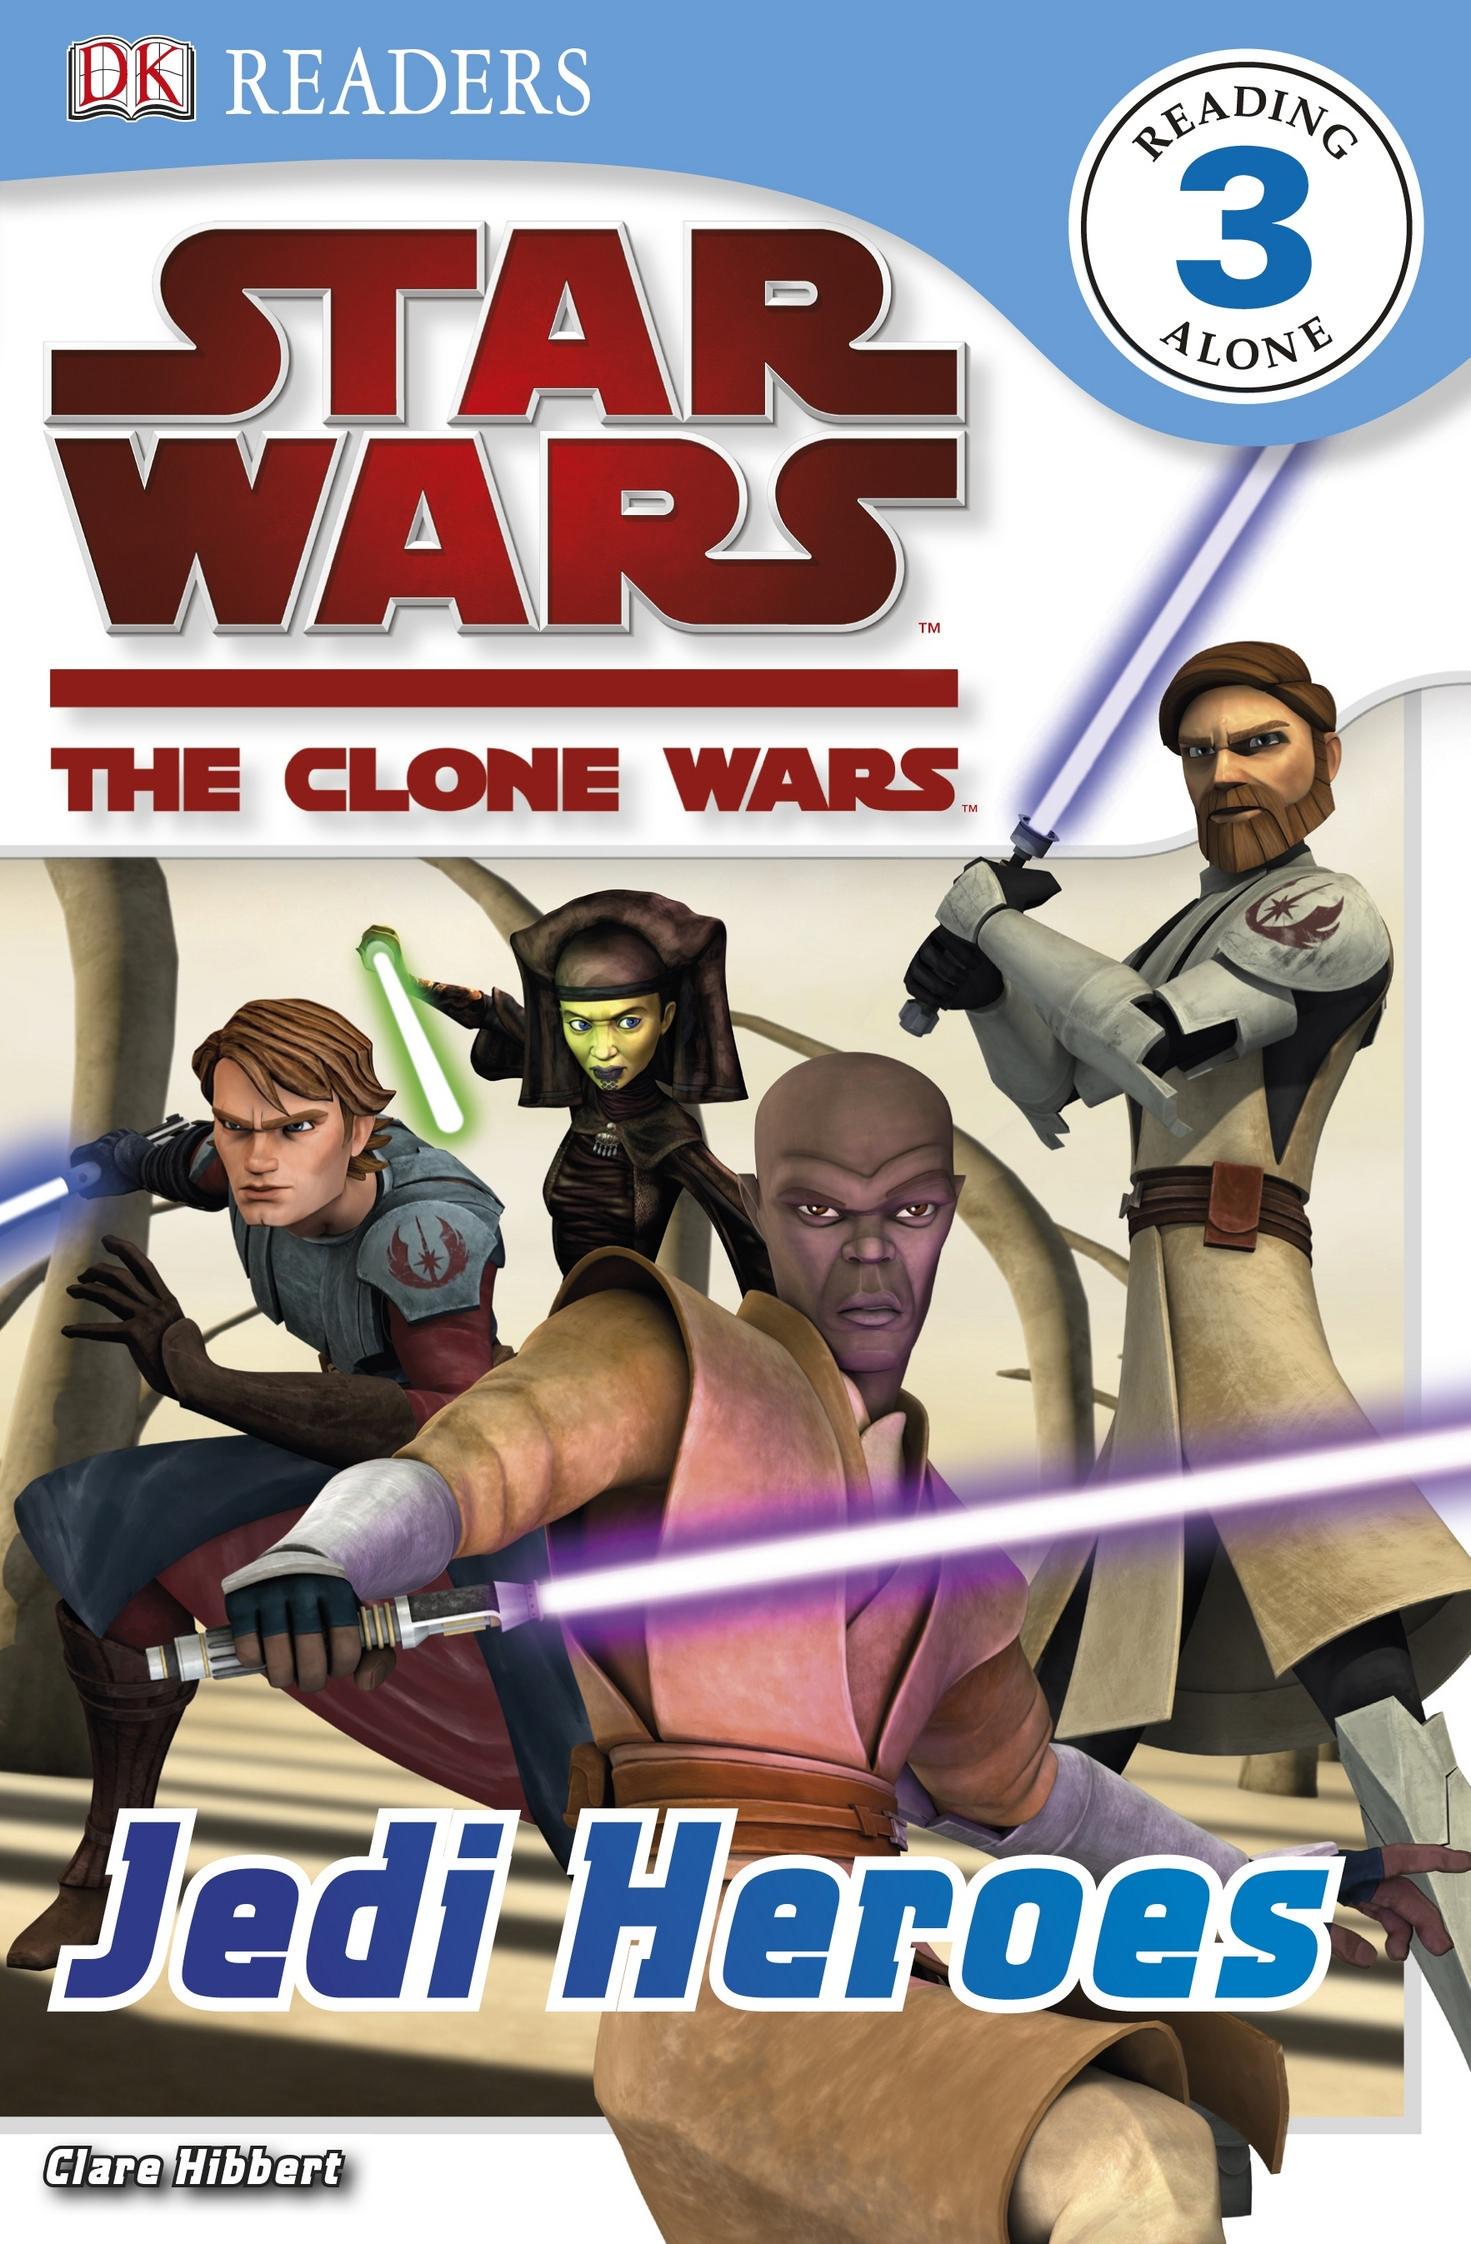 The Clone Wars: Jedi Heroes